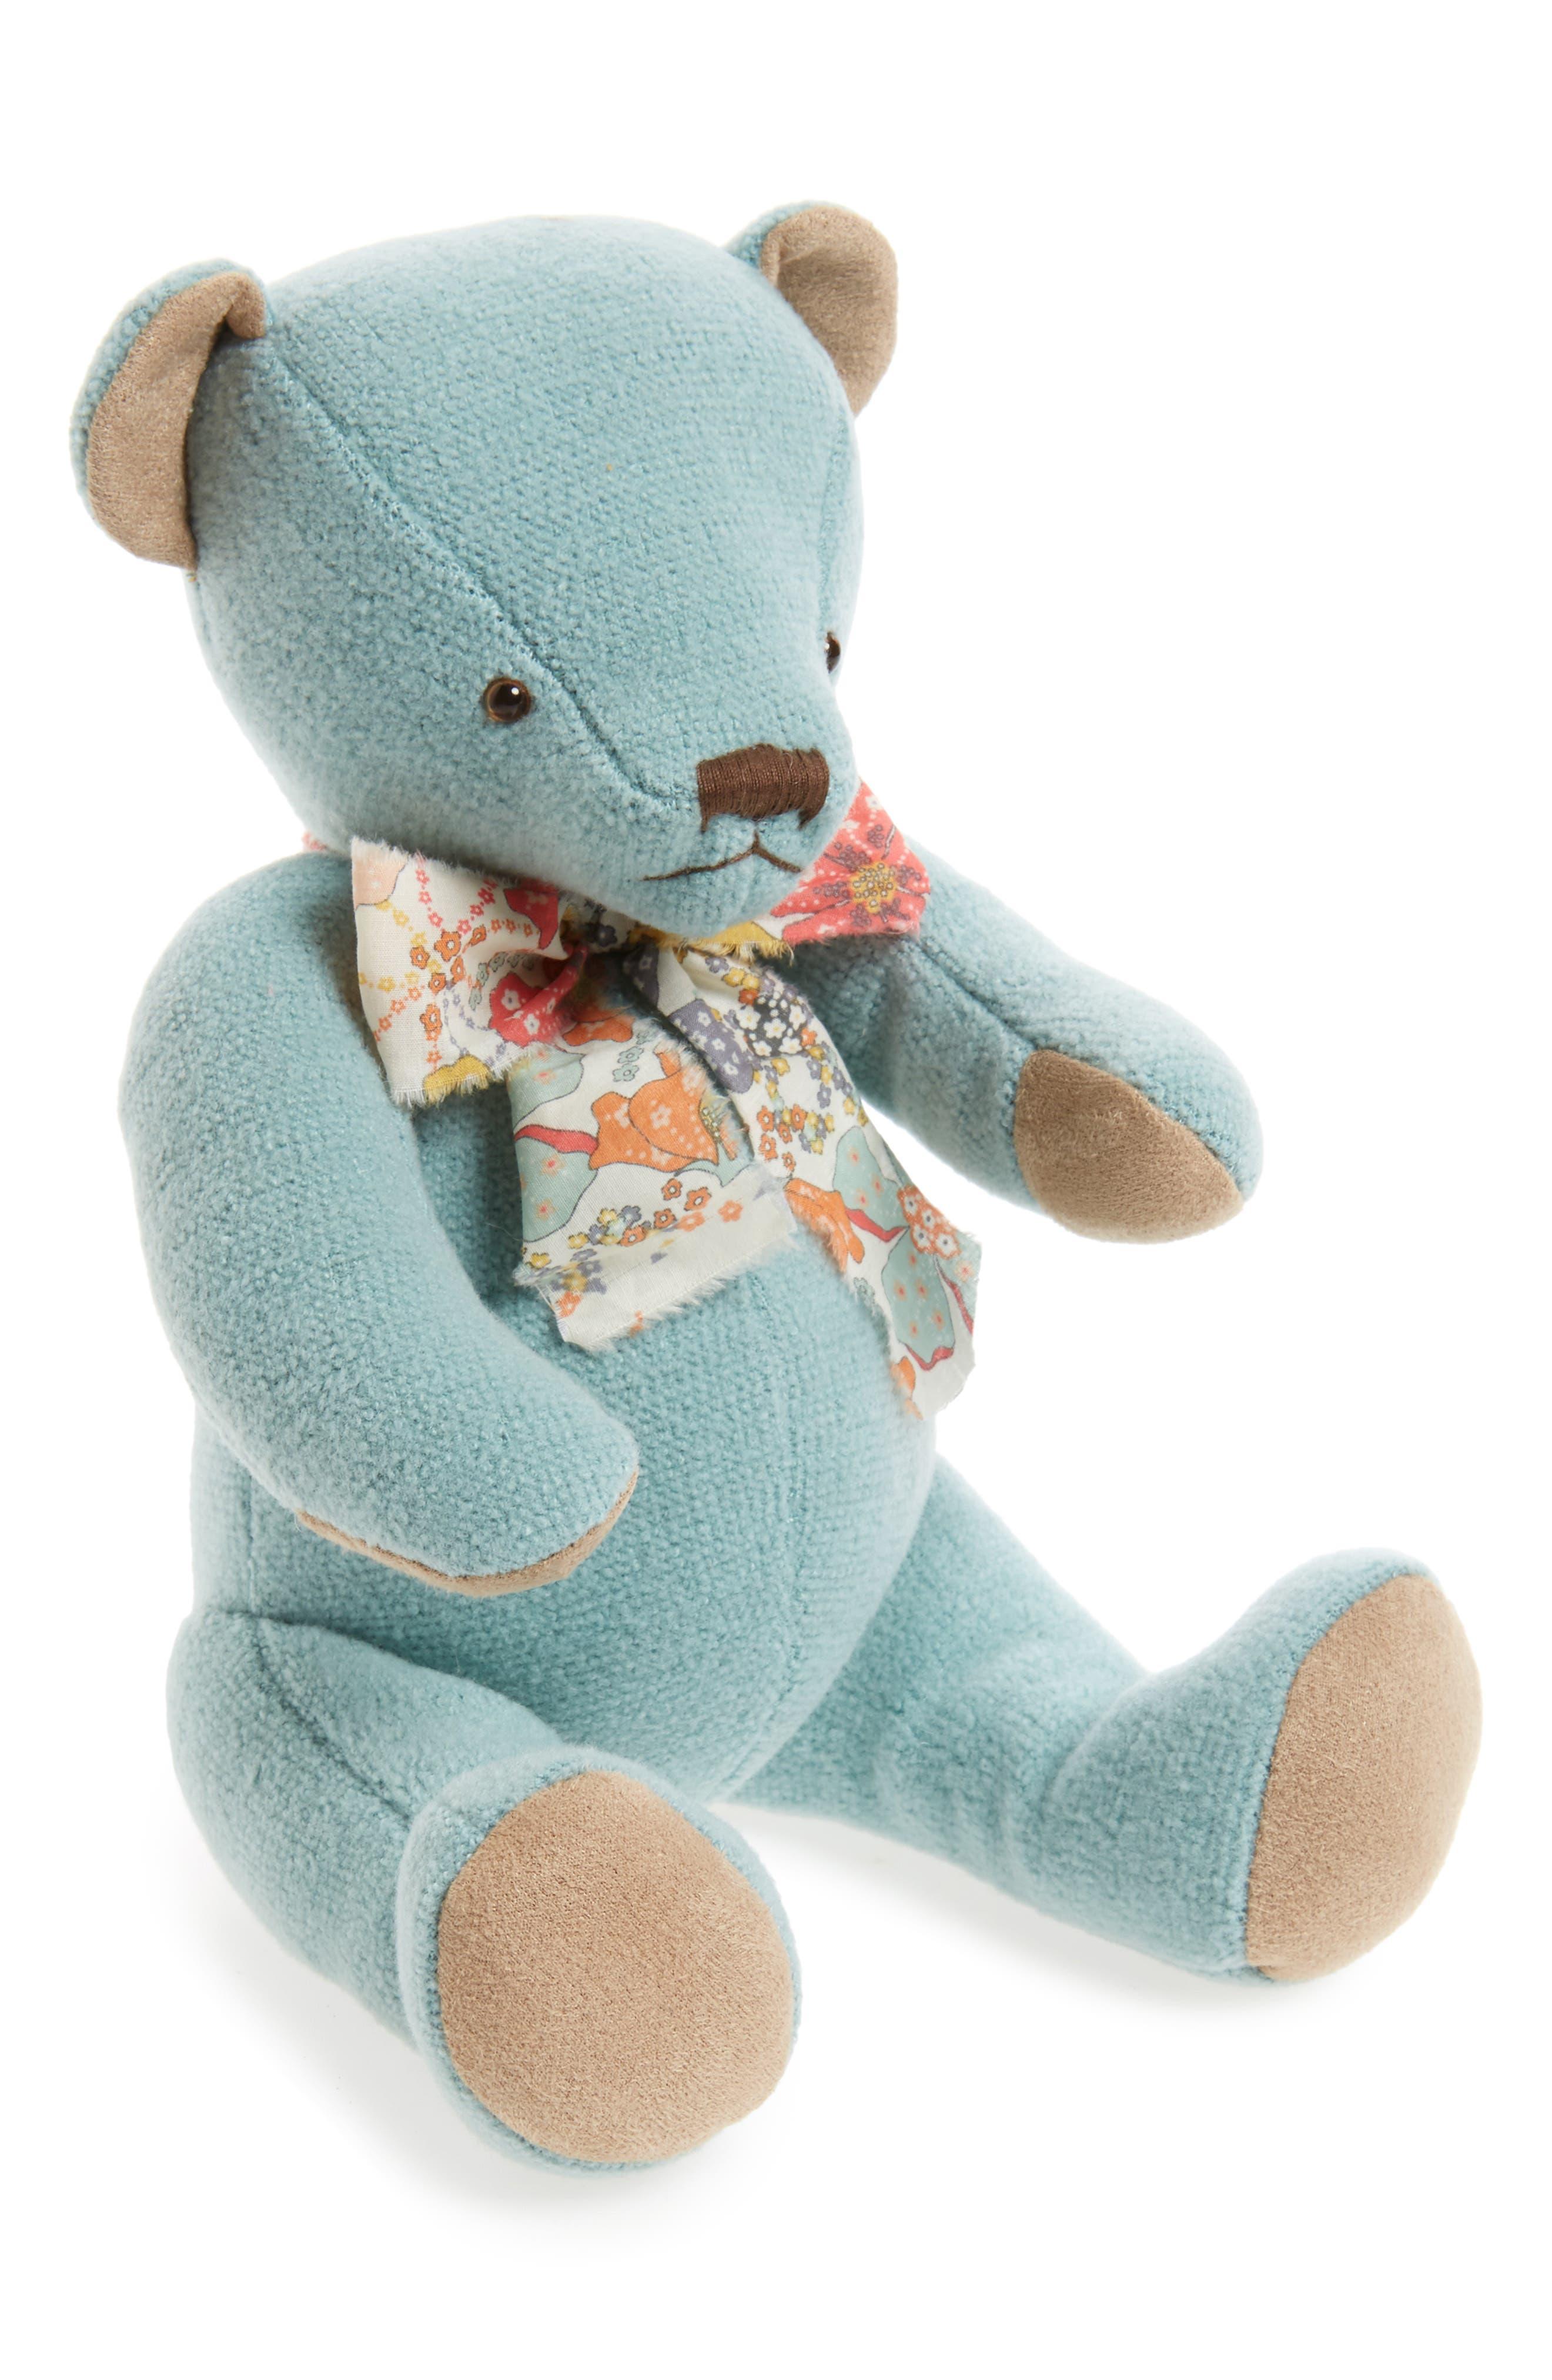 Alternate Image 1 Selected - Maileg Teddy Bear Stuffed Animal